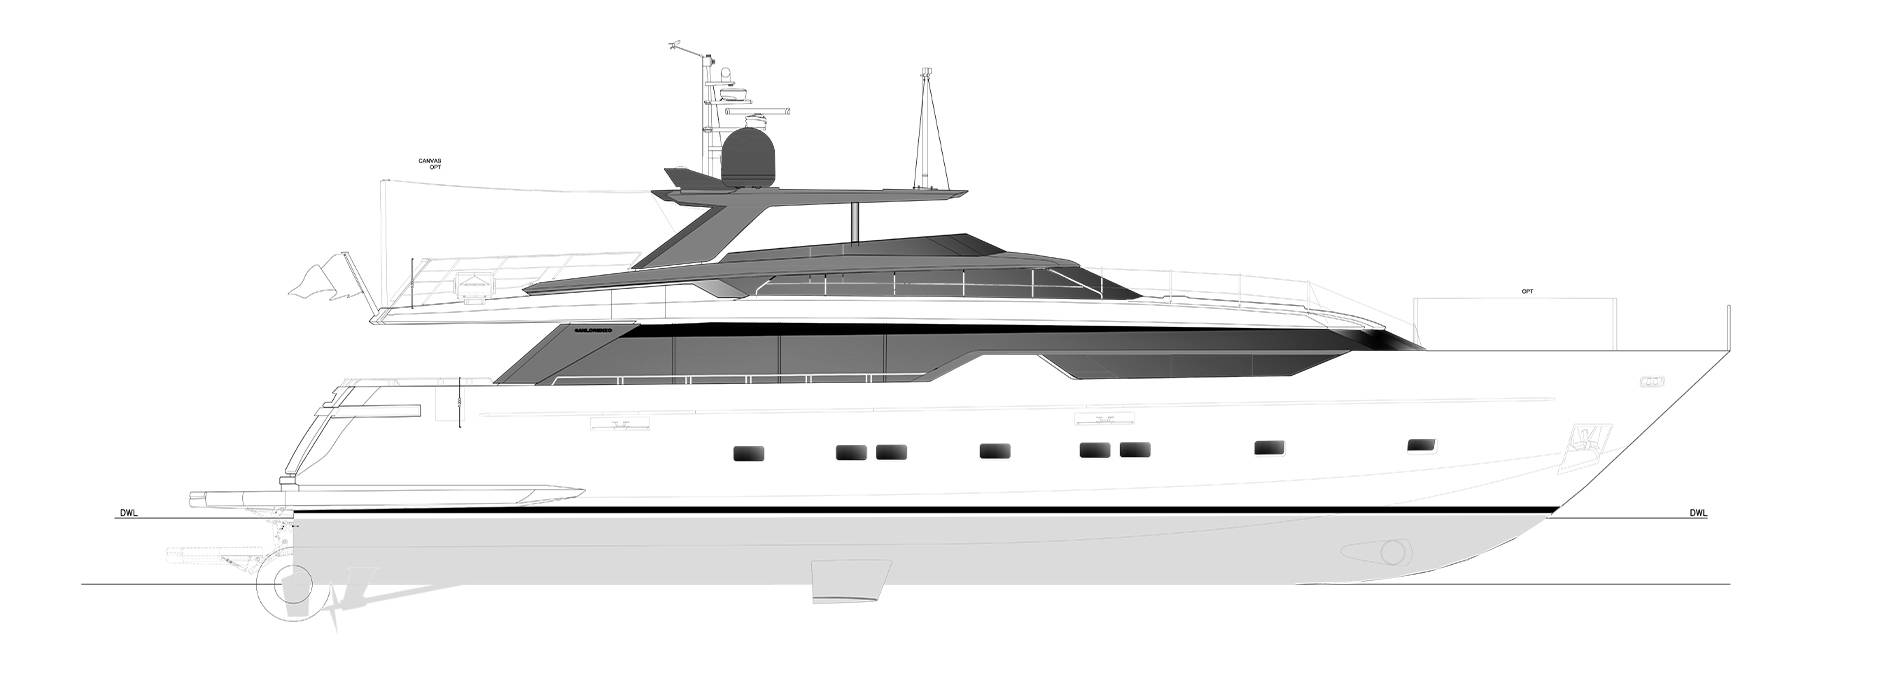 Sanlorenzo Yachts SL102A-746 Profile